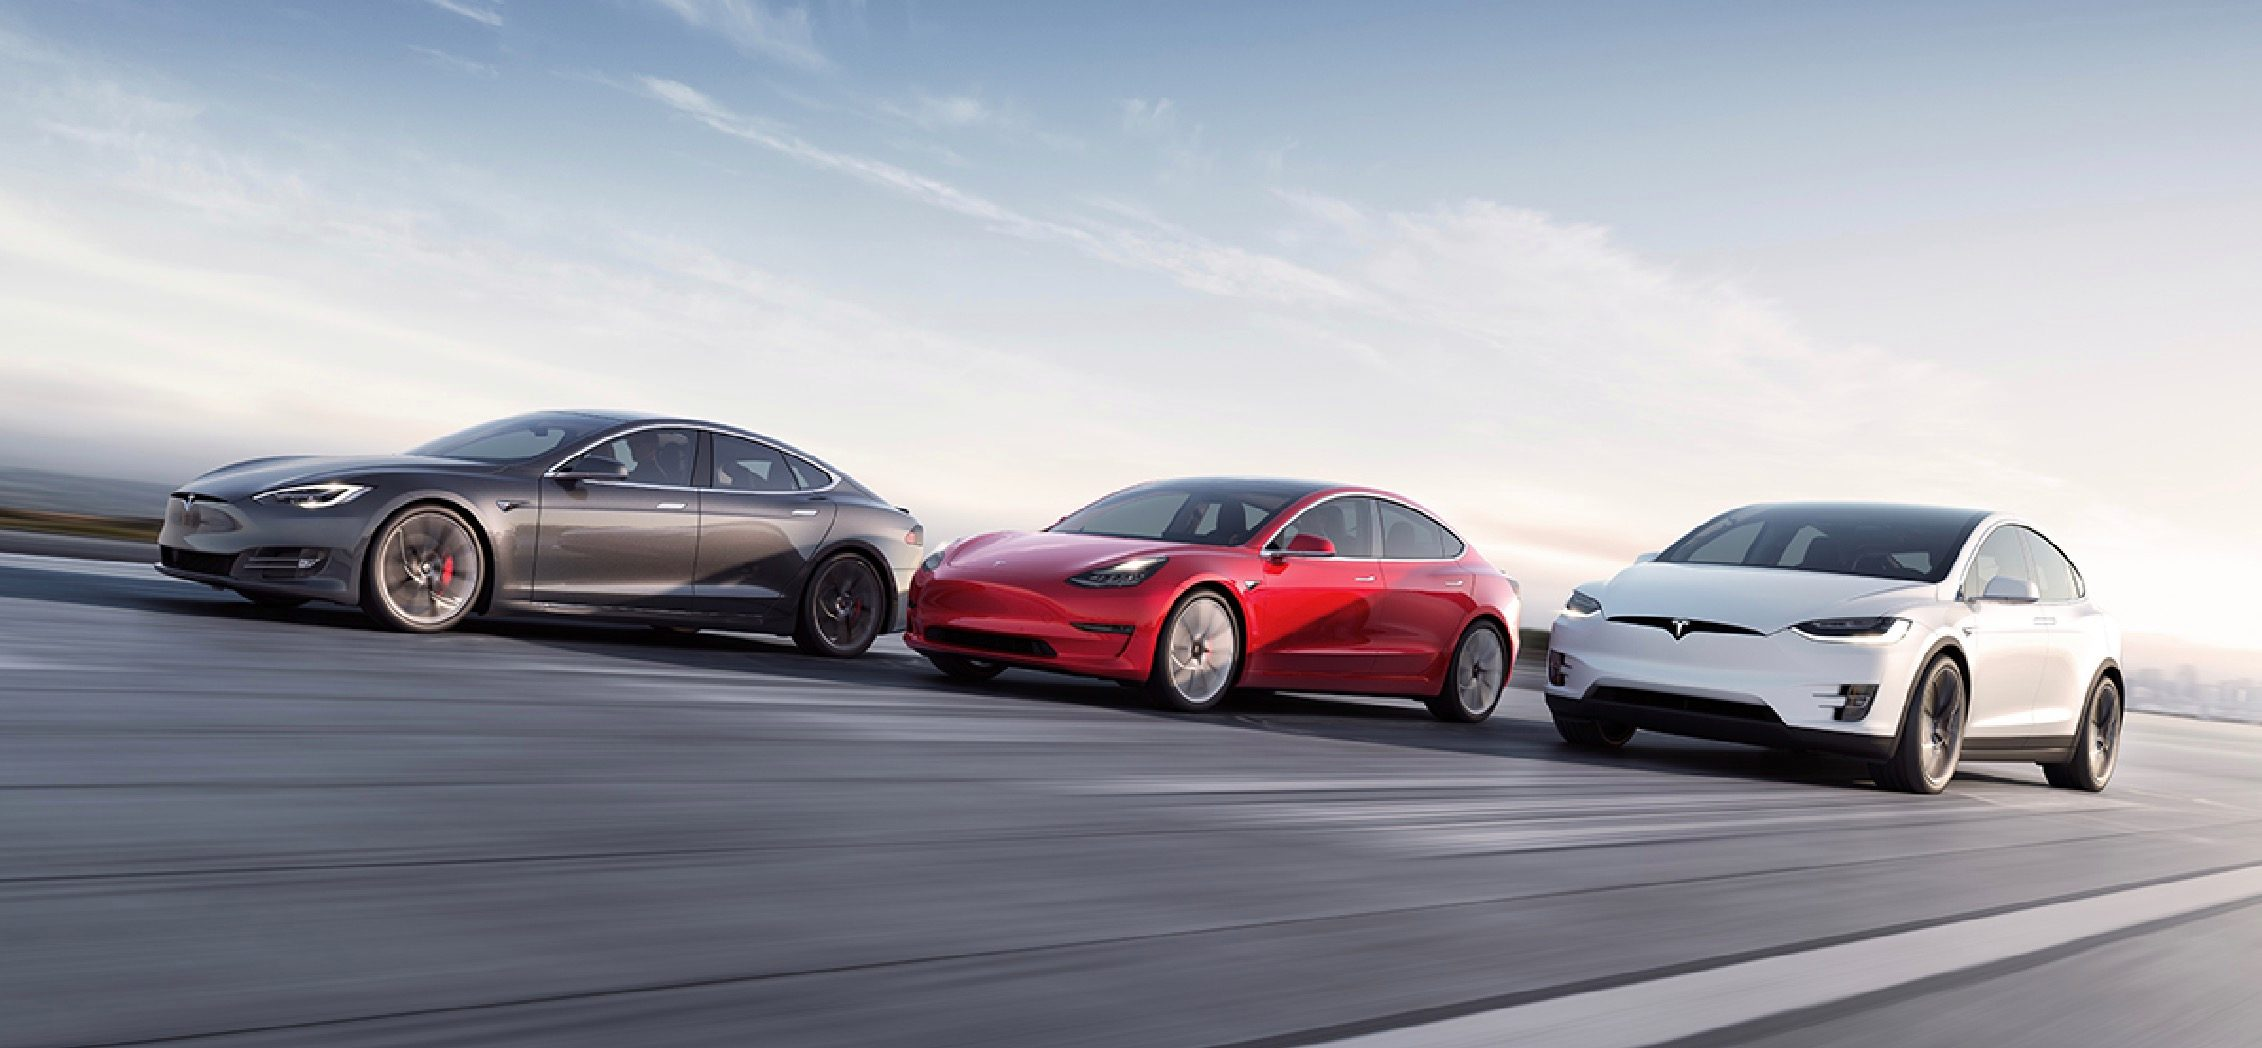 Tesla (DSLA): Elon Musk says 'registration is possible' in leaked employee email